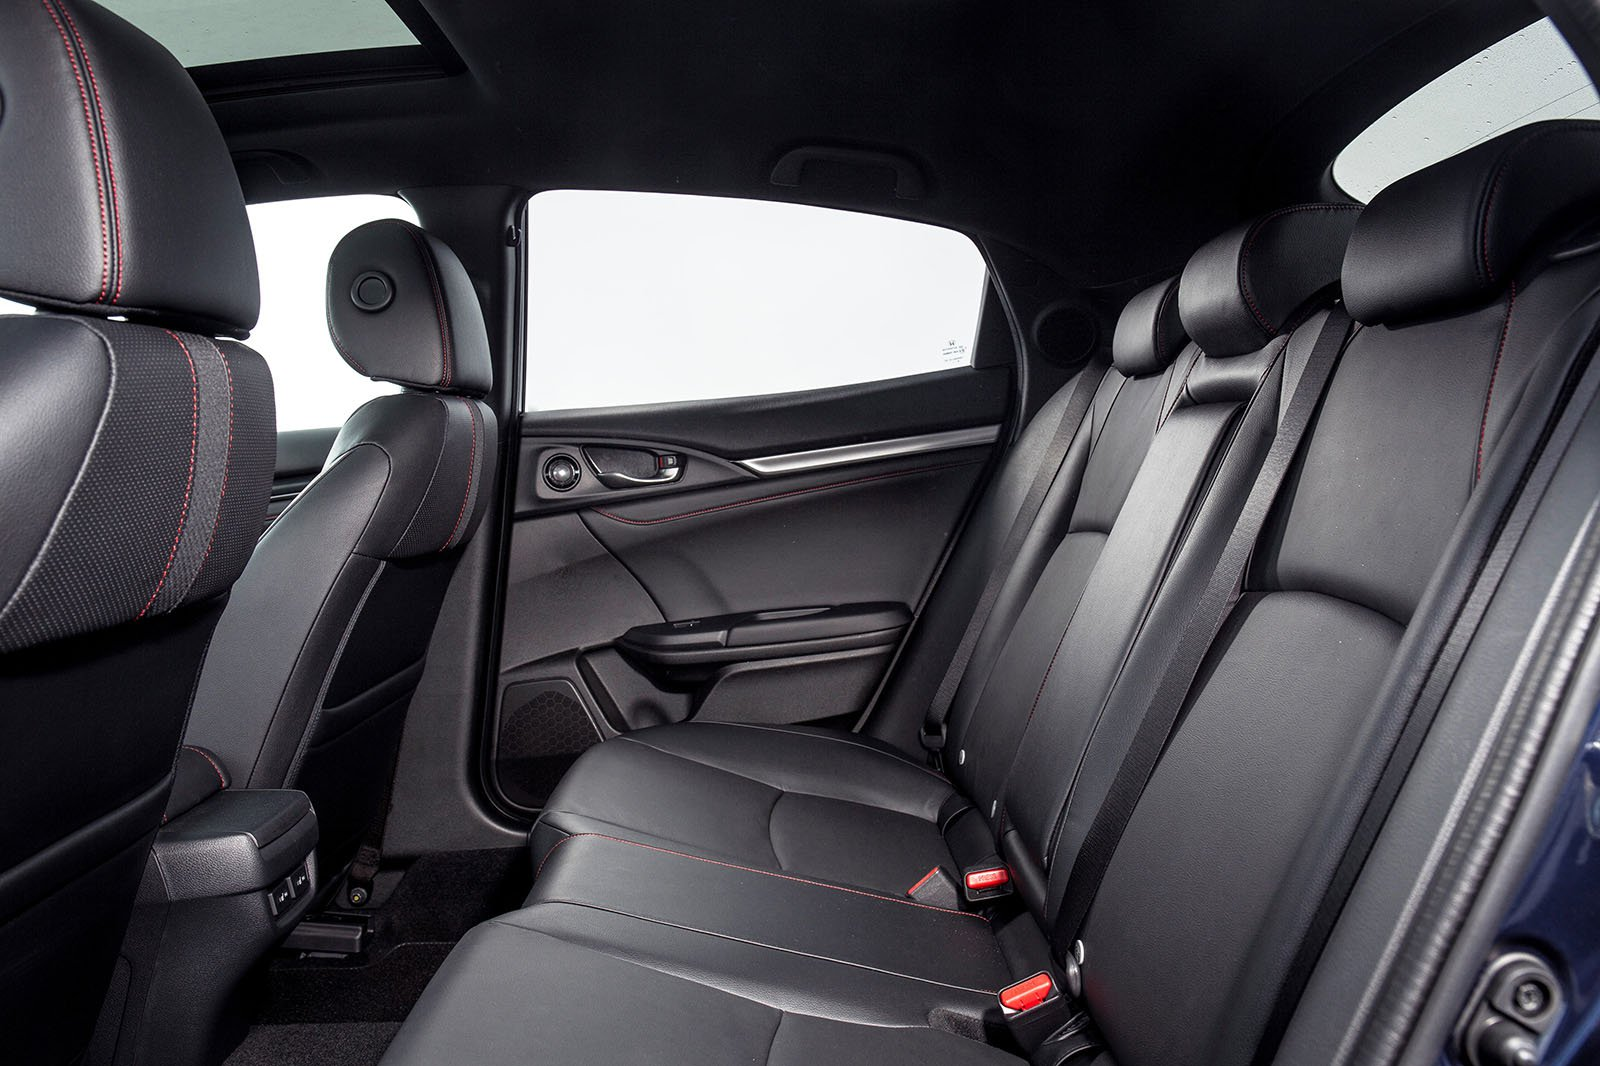 Honda Civic Hatchback 2019 rear seats RHD